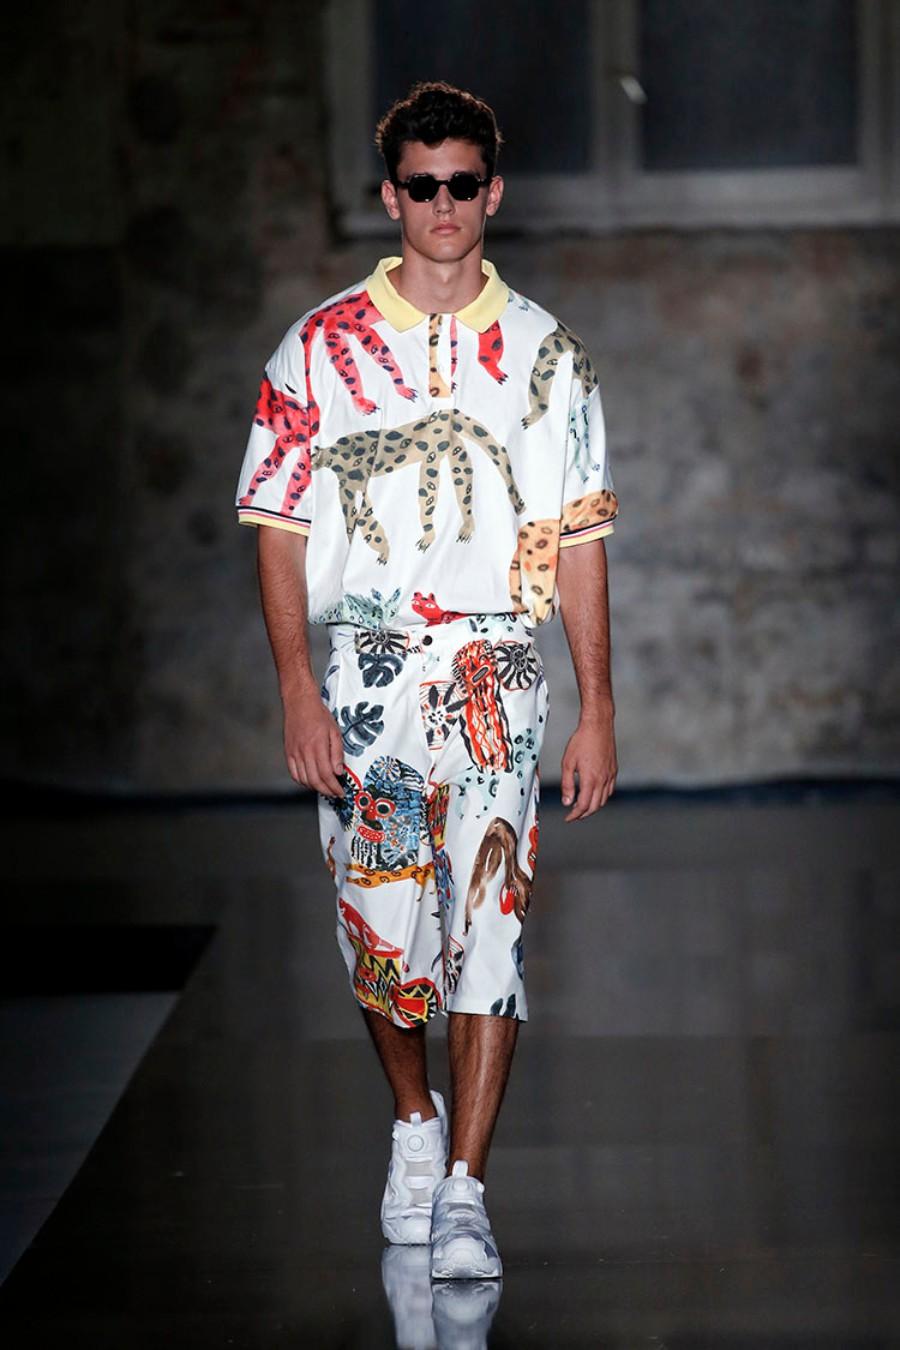 080 Barcelona Fashion Week: Round-Up